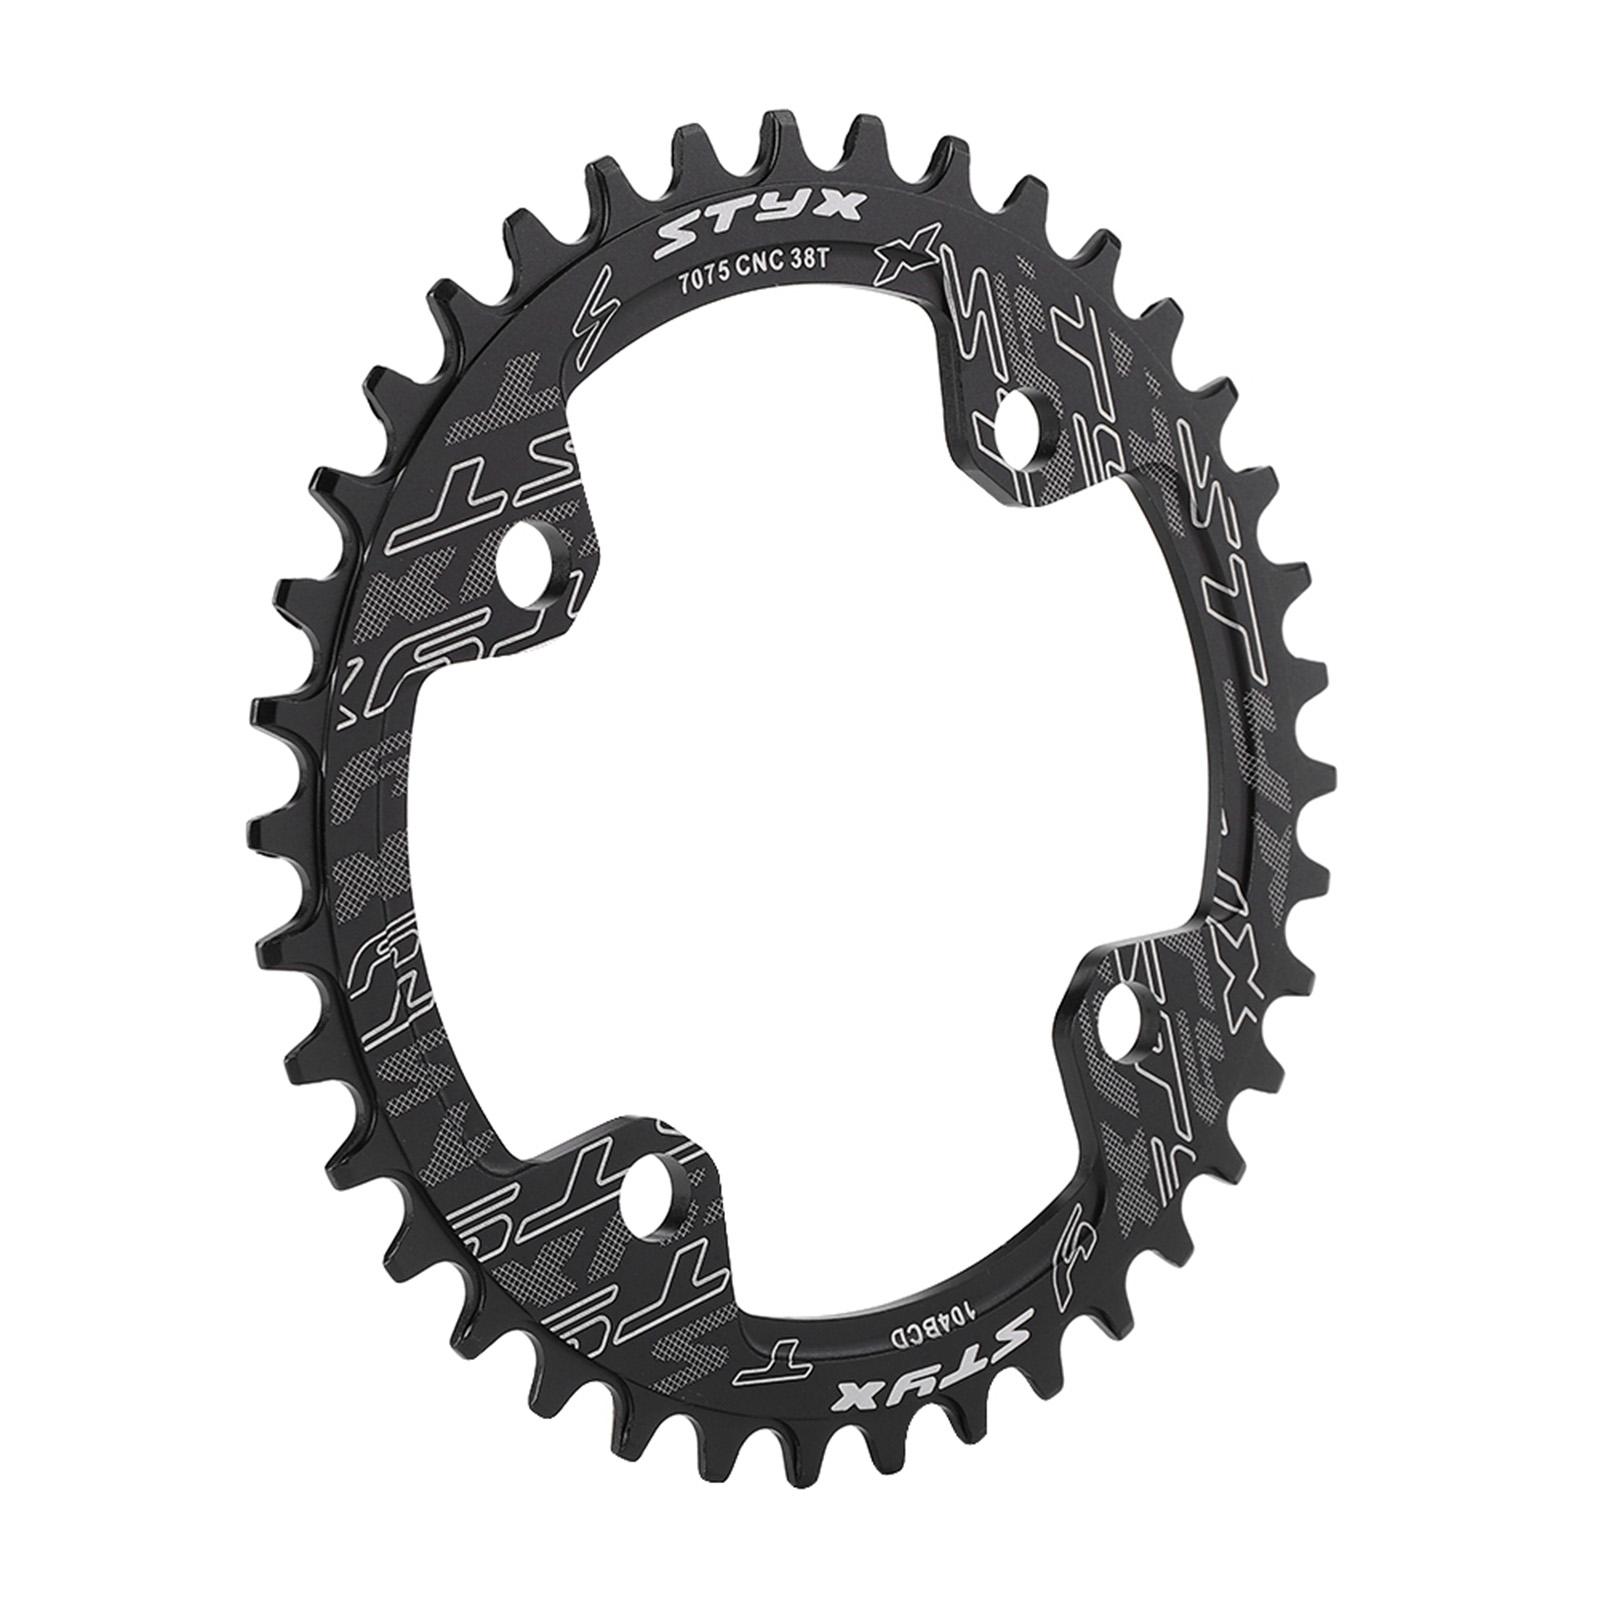 Keenso Bike Chain Ring 32//34//36//38T BCD Aluminum Alloy Mountain Bike Steel Single Crank Chain Ring Round Gear Bicycle Chain Ring for Mountain Bike Repairing